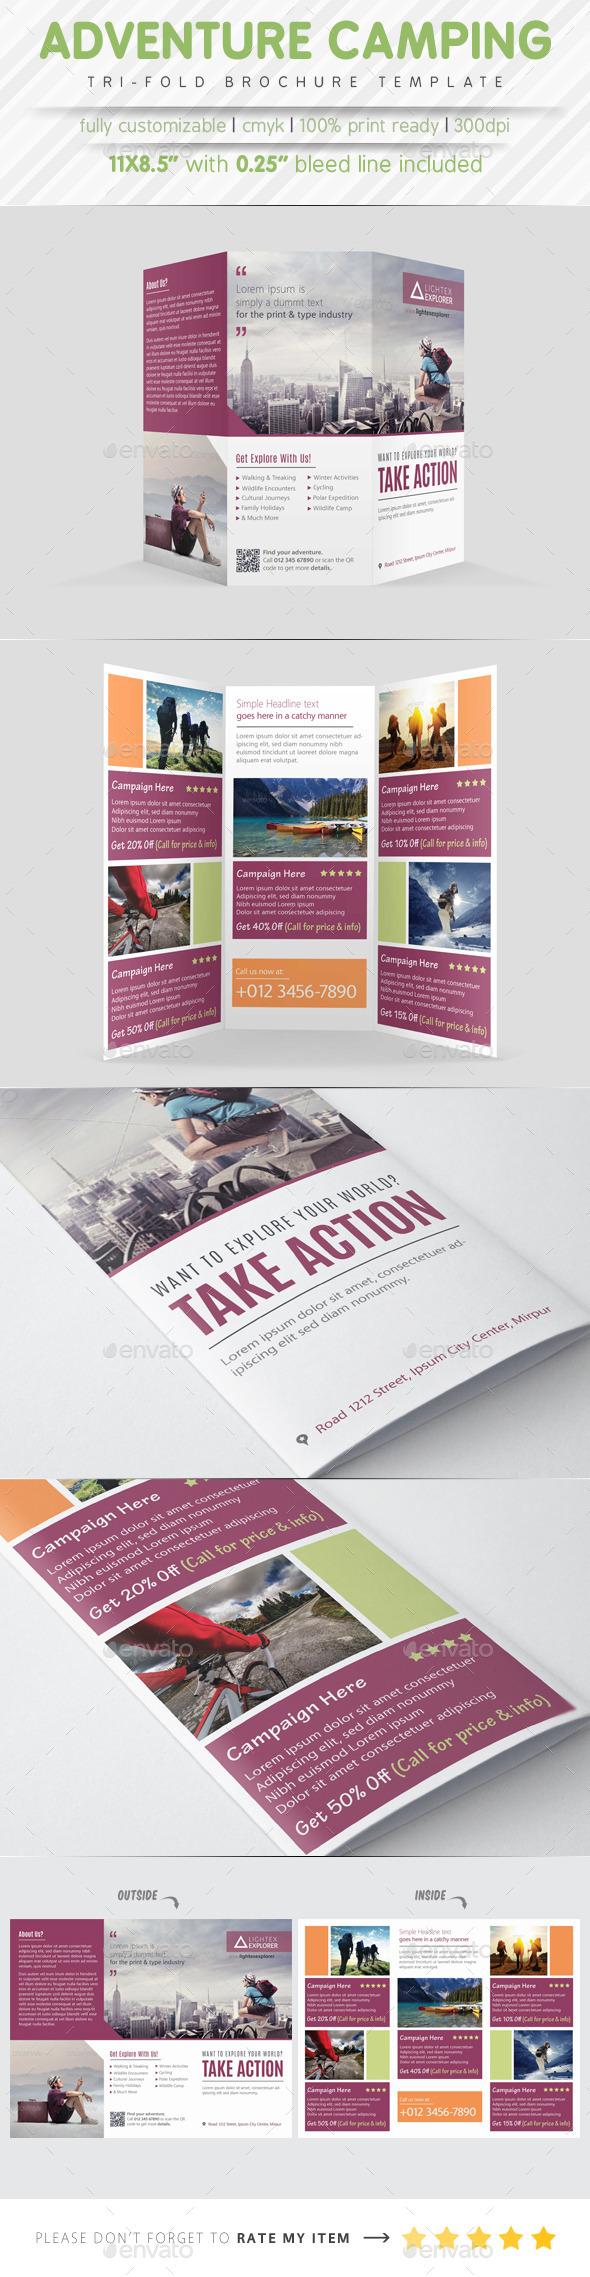 Adventure Camping Tri Fold Brochure - Brochures Print Templates